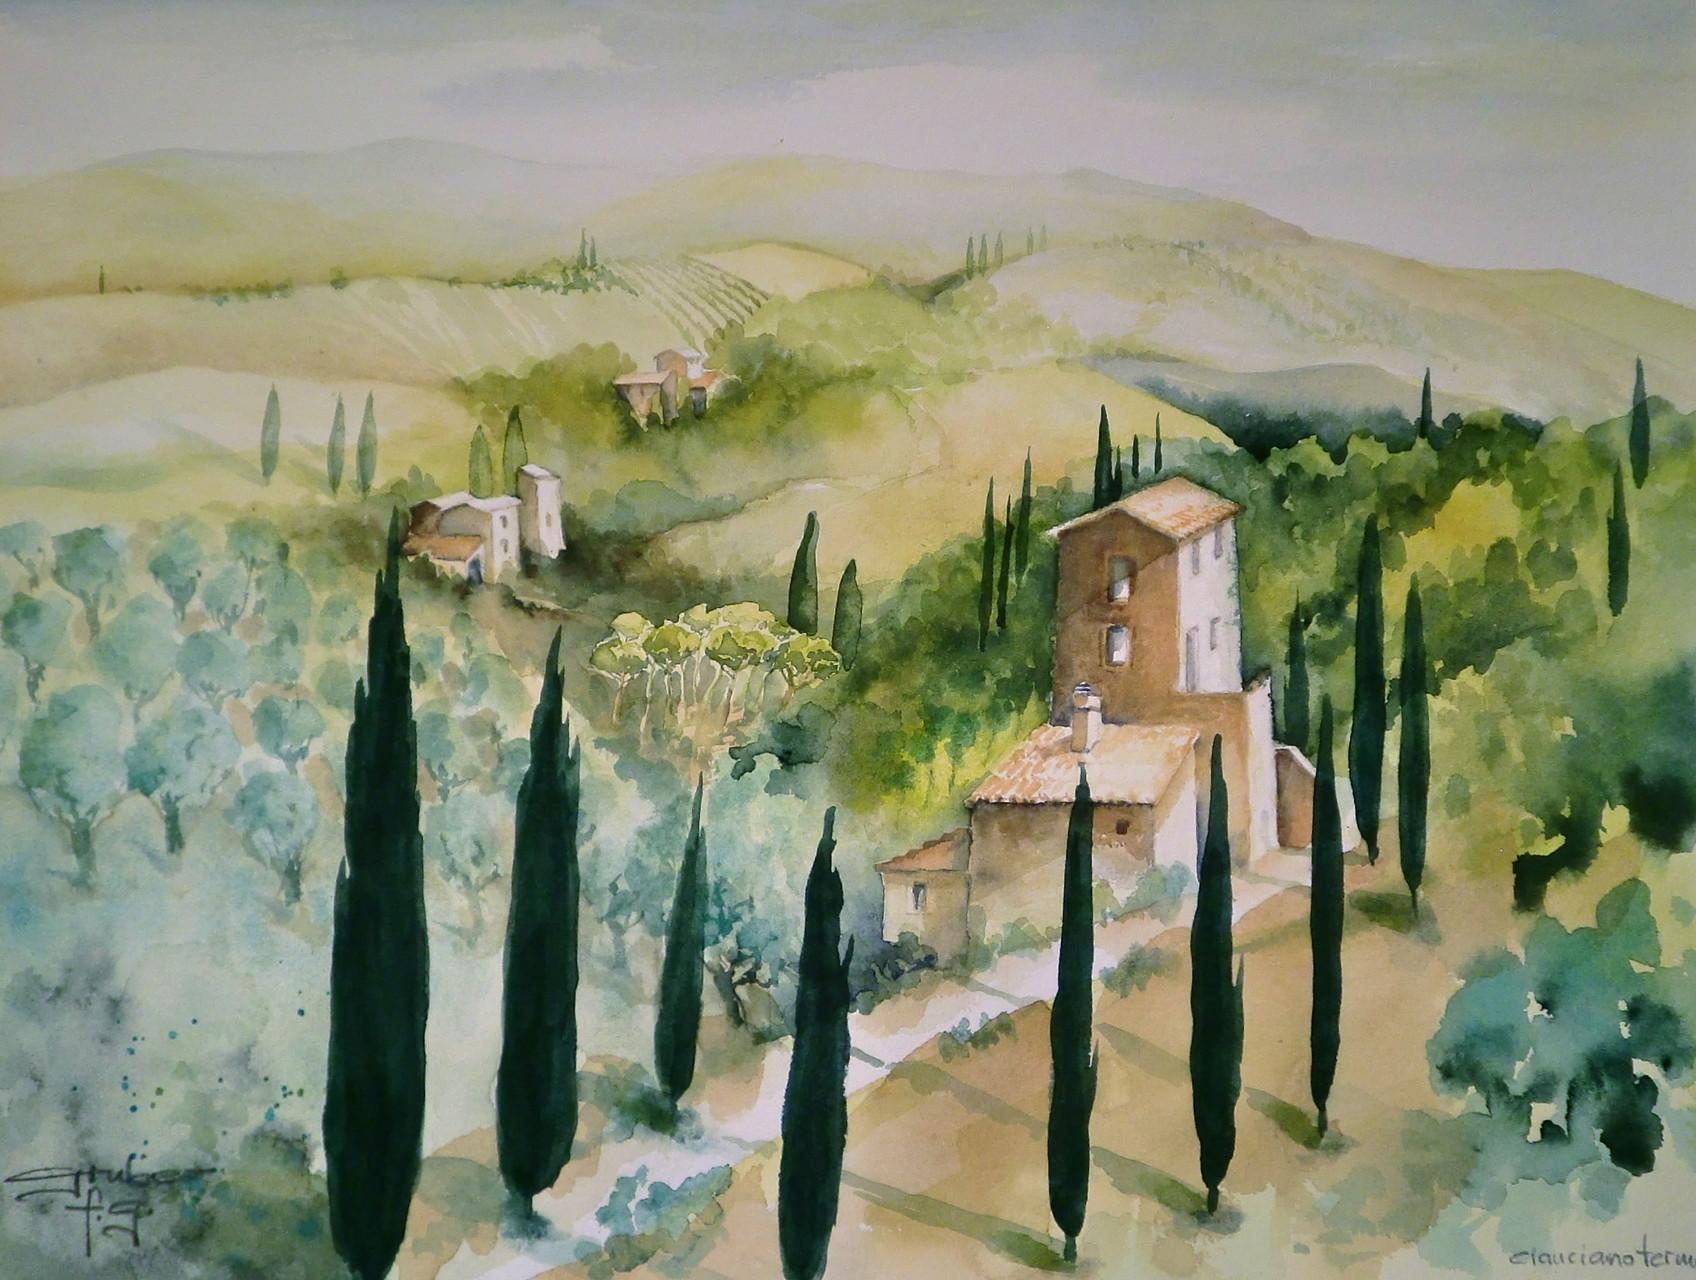 aquarell - villa bei montepulciano - toskana